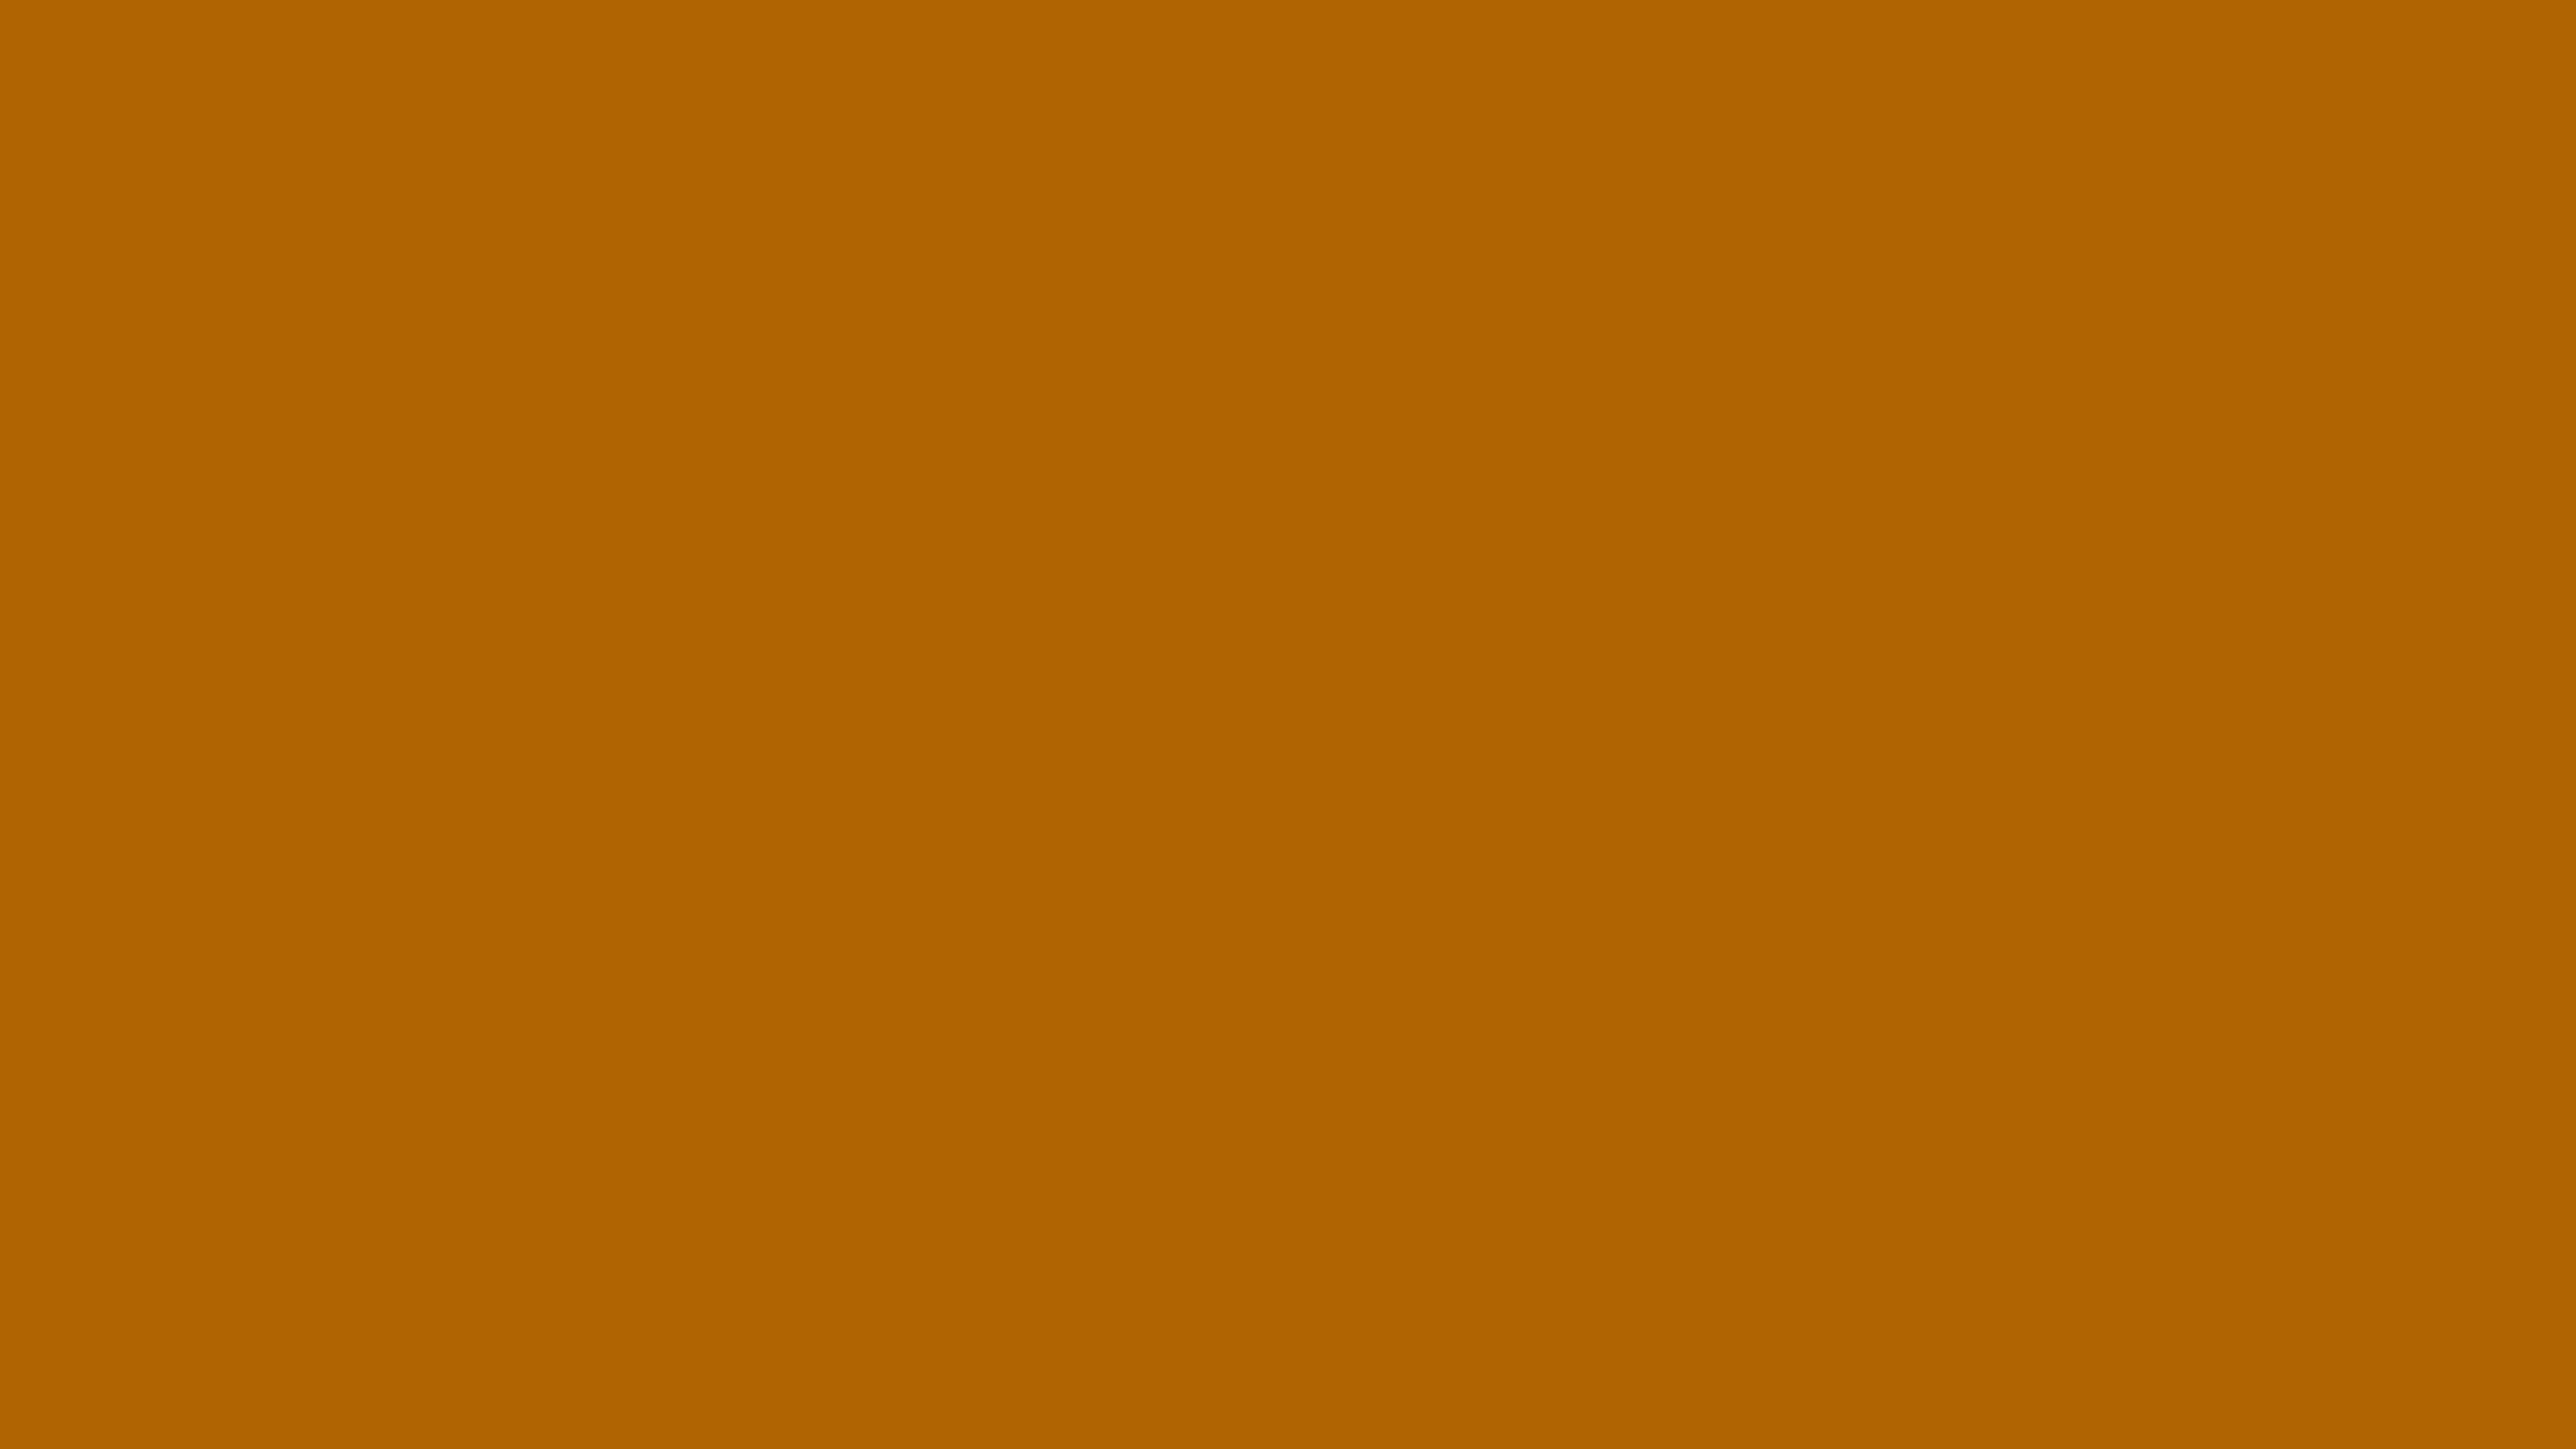 4096x2304 Ginger Solid Color Background